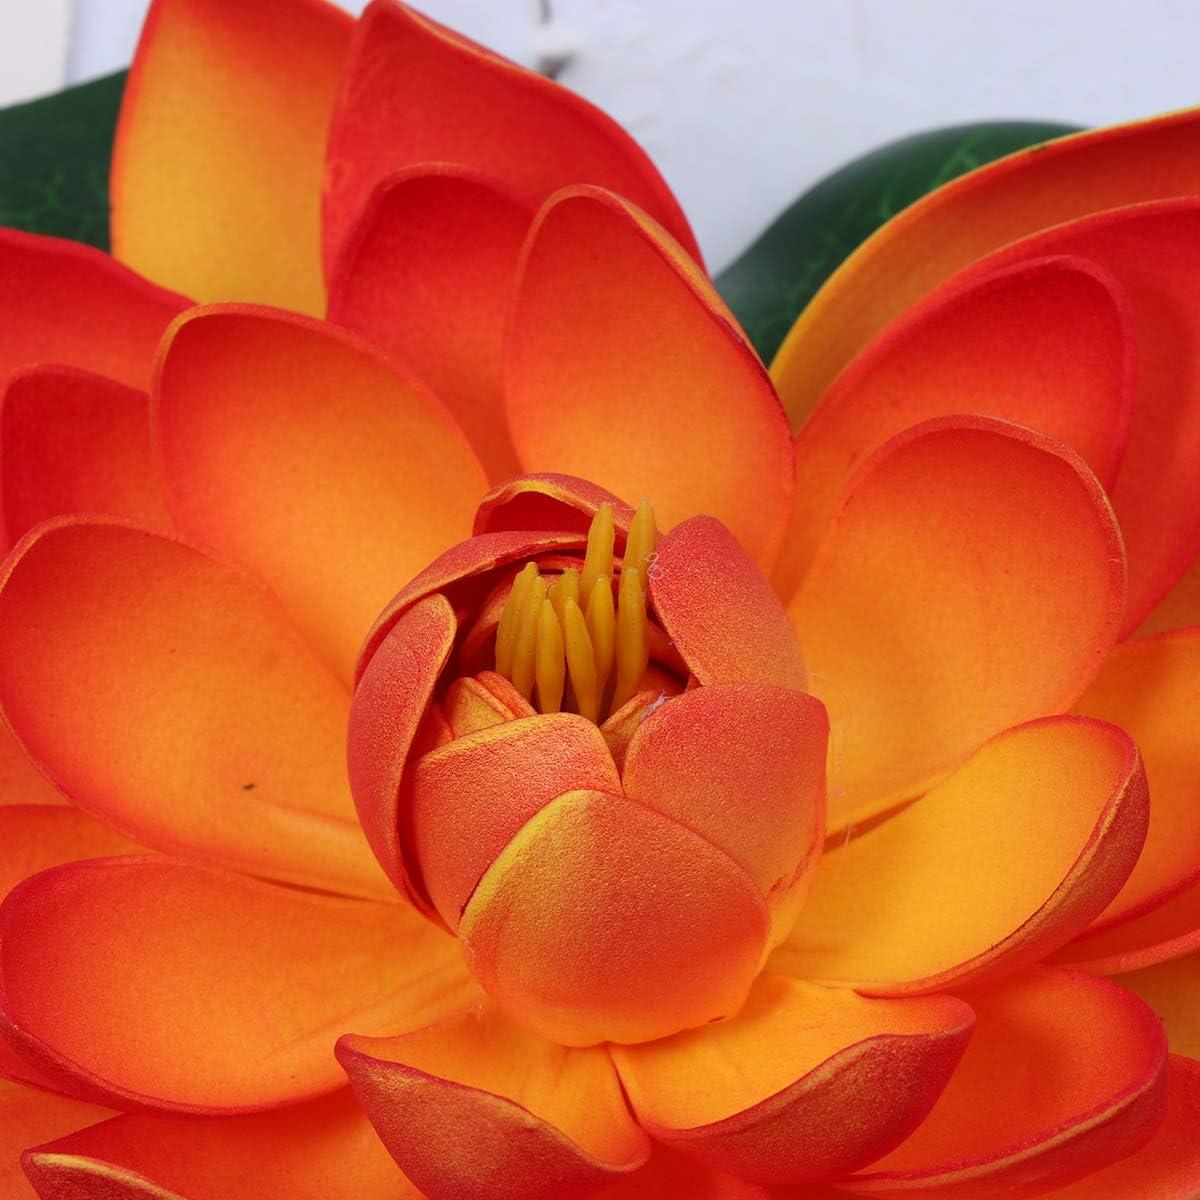 Yardwe Artificial Floating Lotus Flowers Artificial Water Lily Pads Vivid Flower Ornaments for Aquarium Home Garden Decor